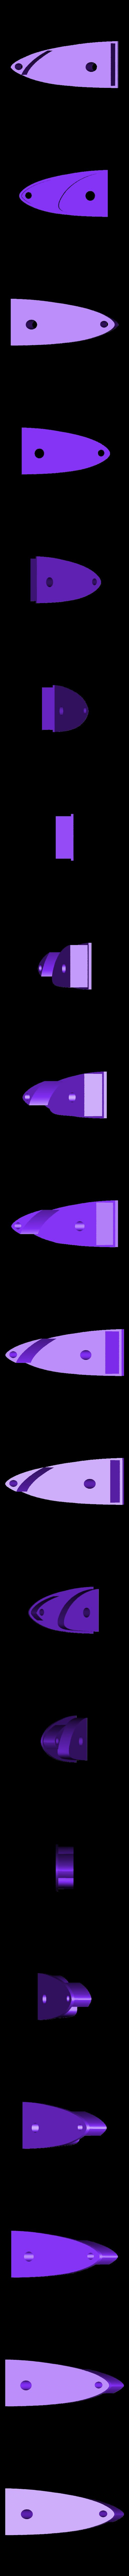 mount_2.stl Download free STL file Leading-Edge Slats for Horten Wing Stiletto • 3D printer model, wersy